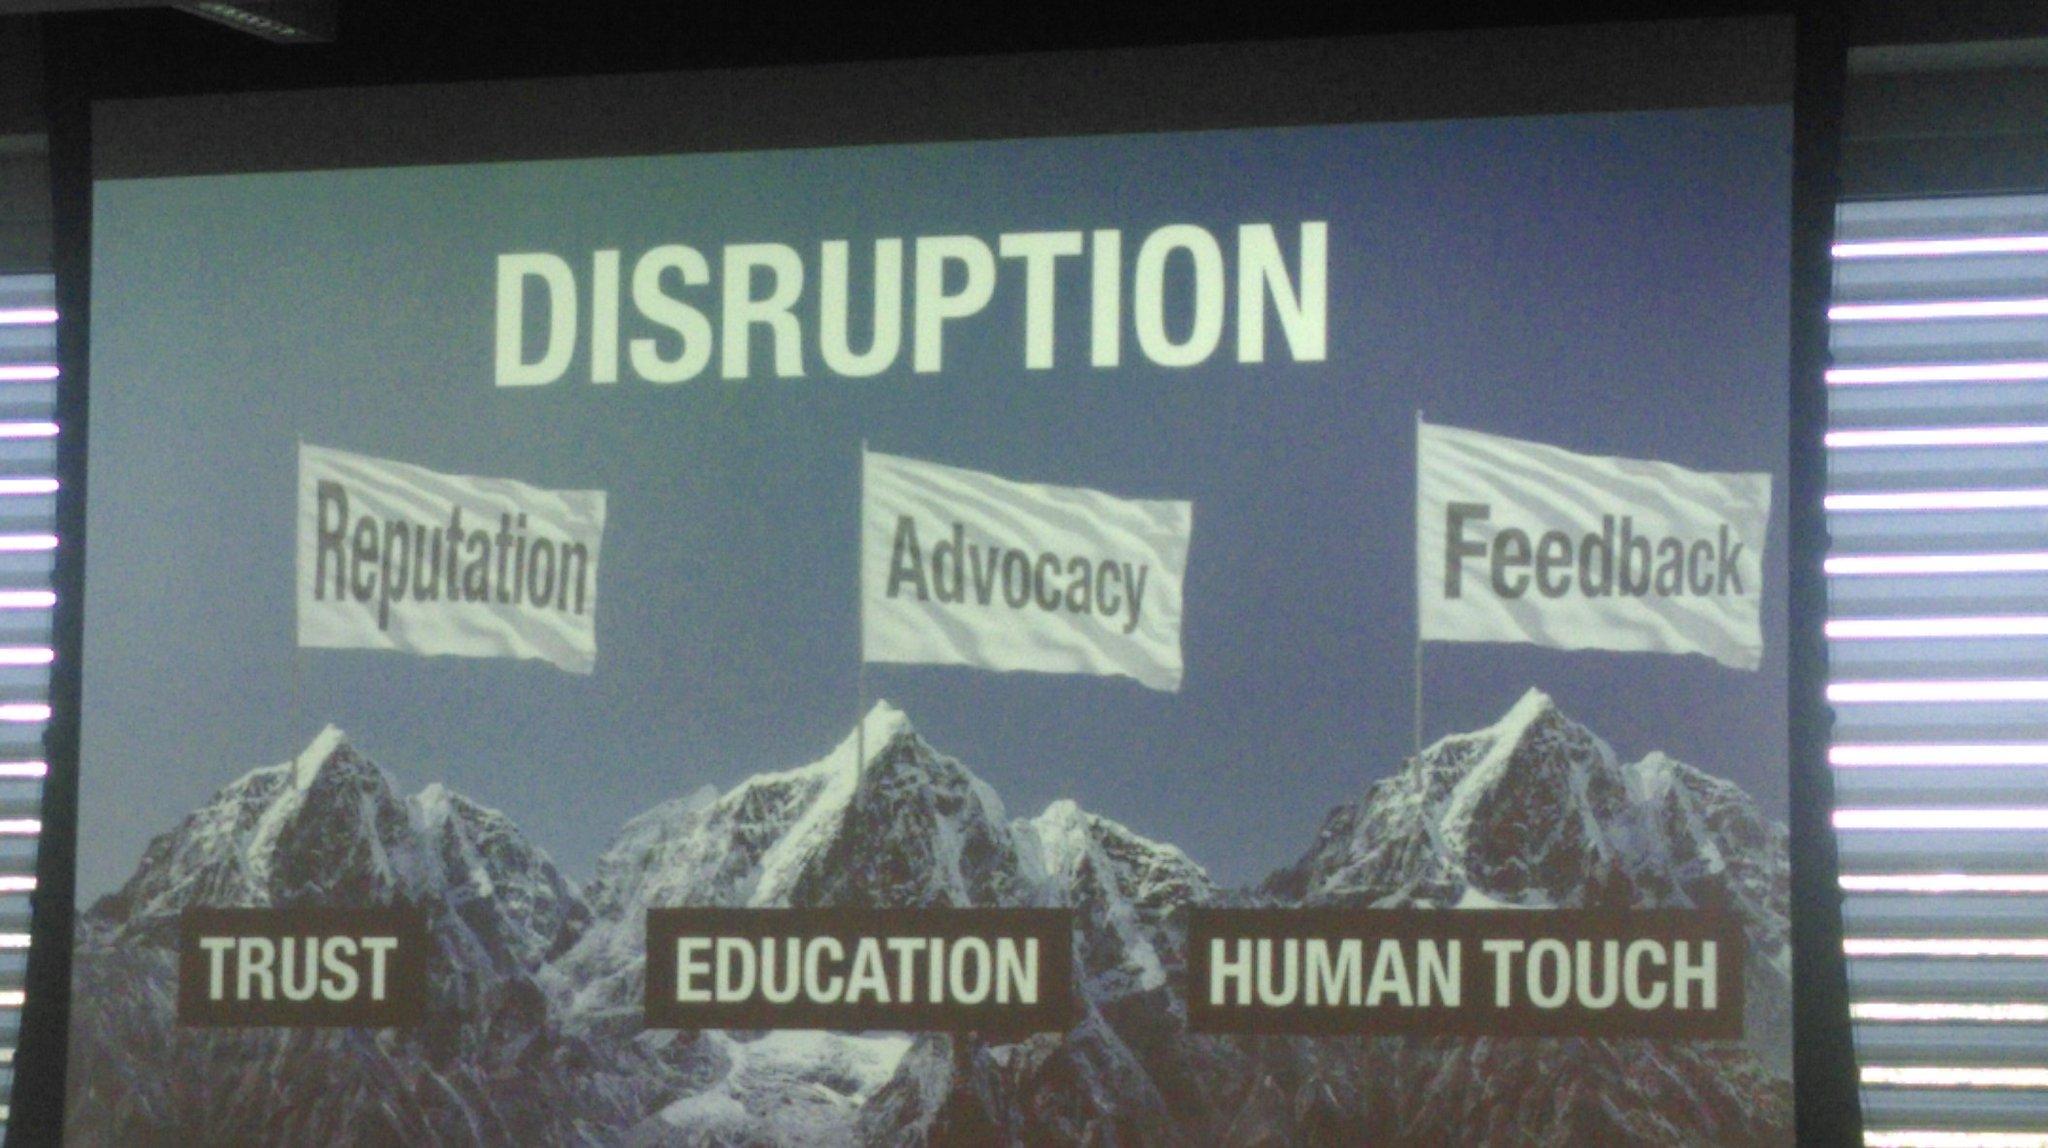 Disruption is definitely a communication matter @GlassesOff_App  #innovation #dive2016 https://t.co/Aag4otwQ96